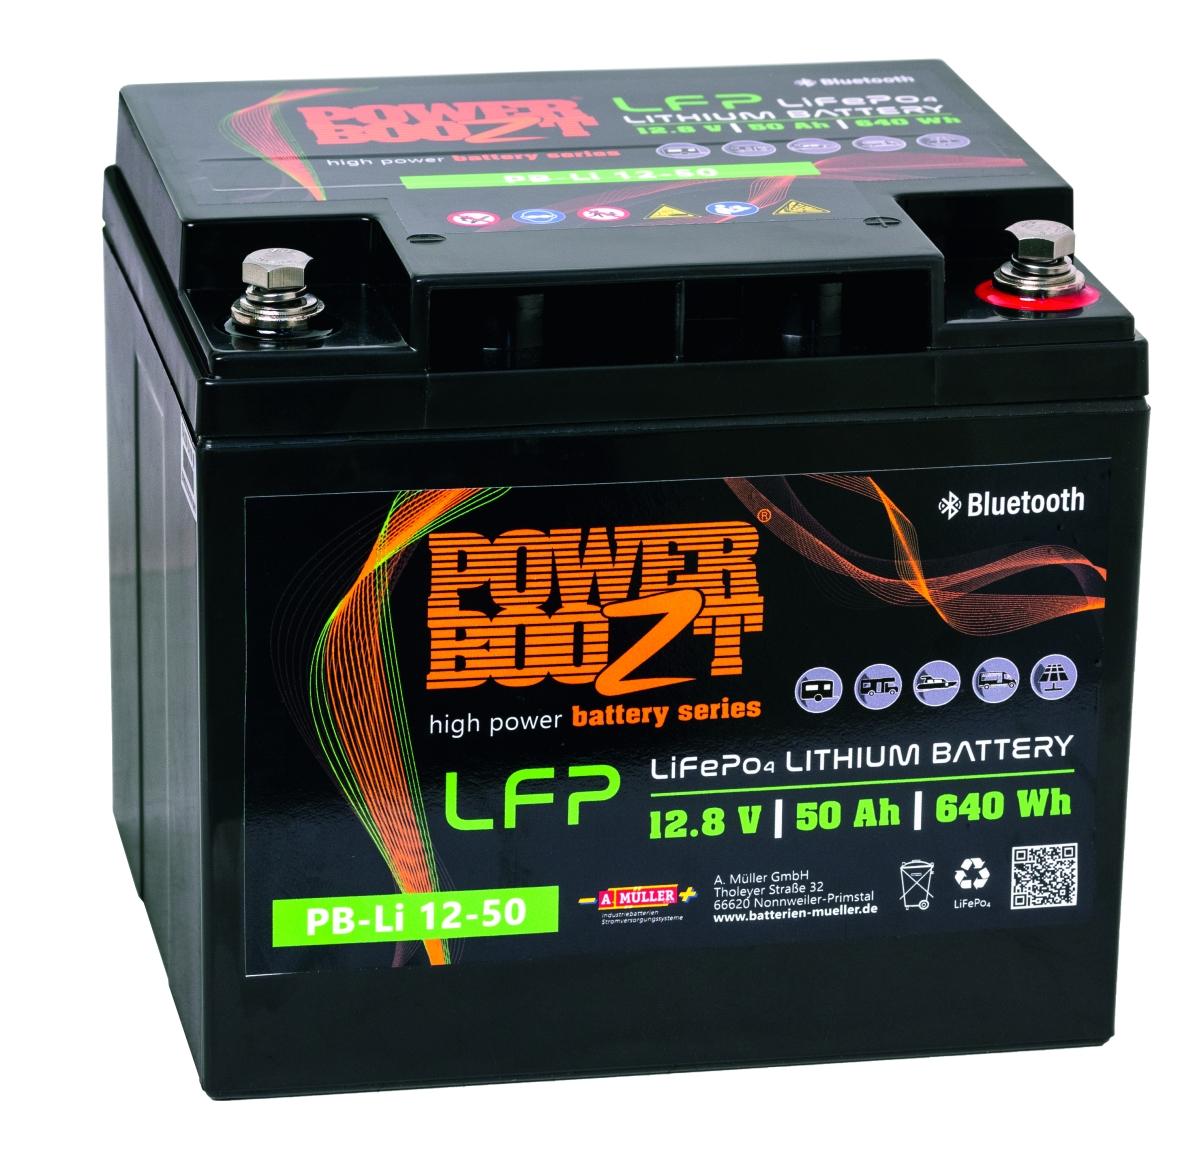 Lithium Batterie PB-Li 12-50